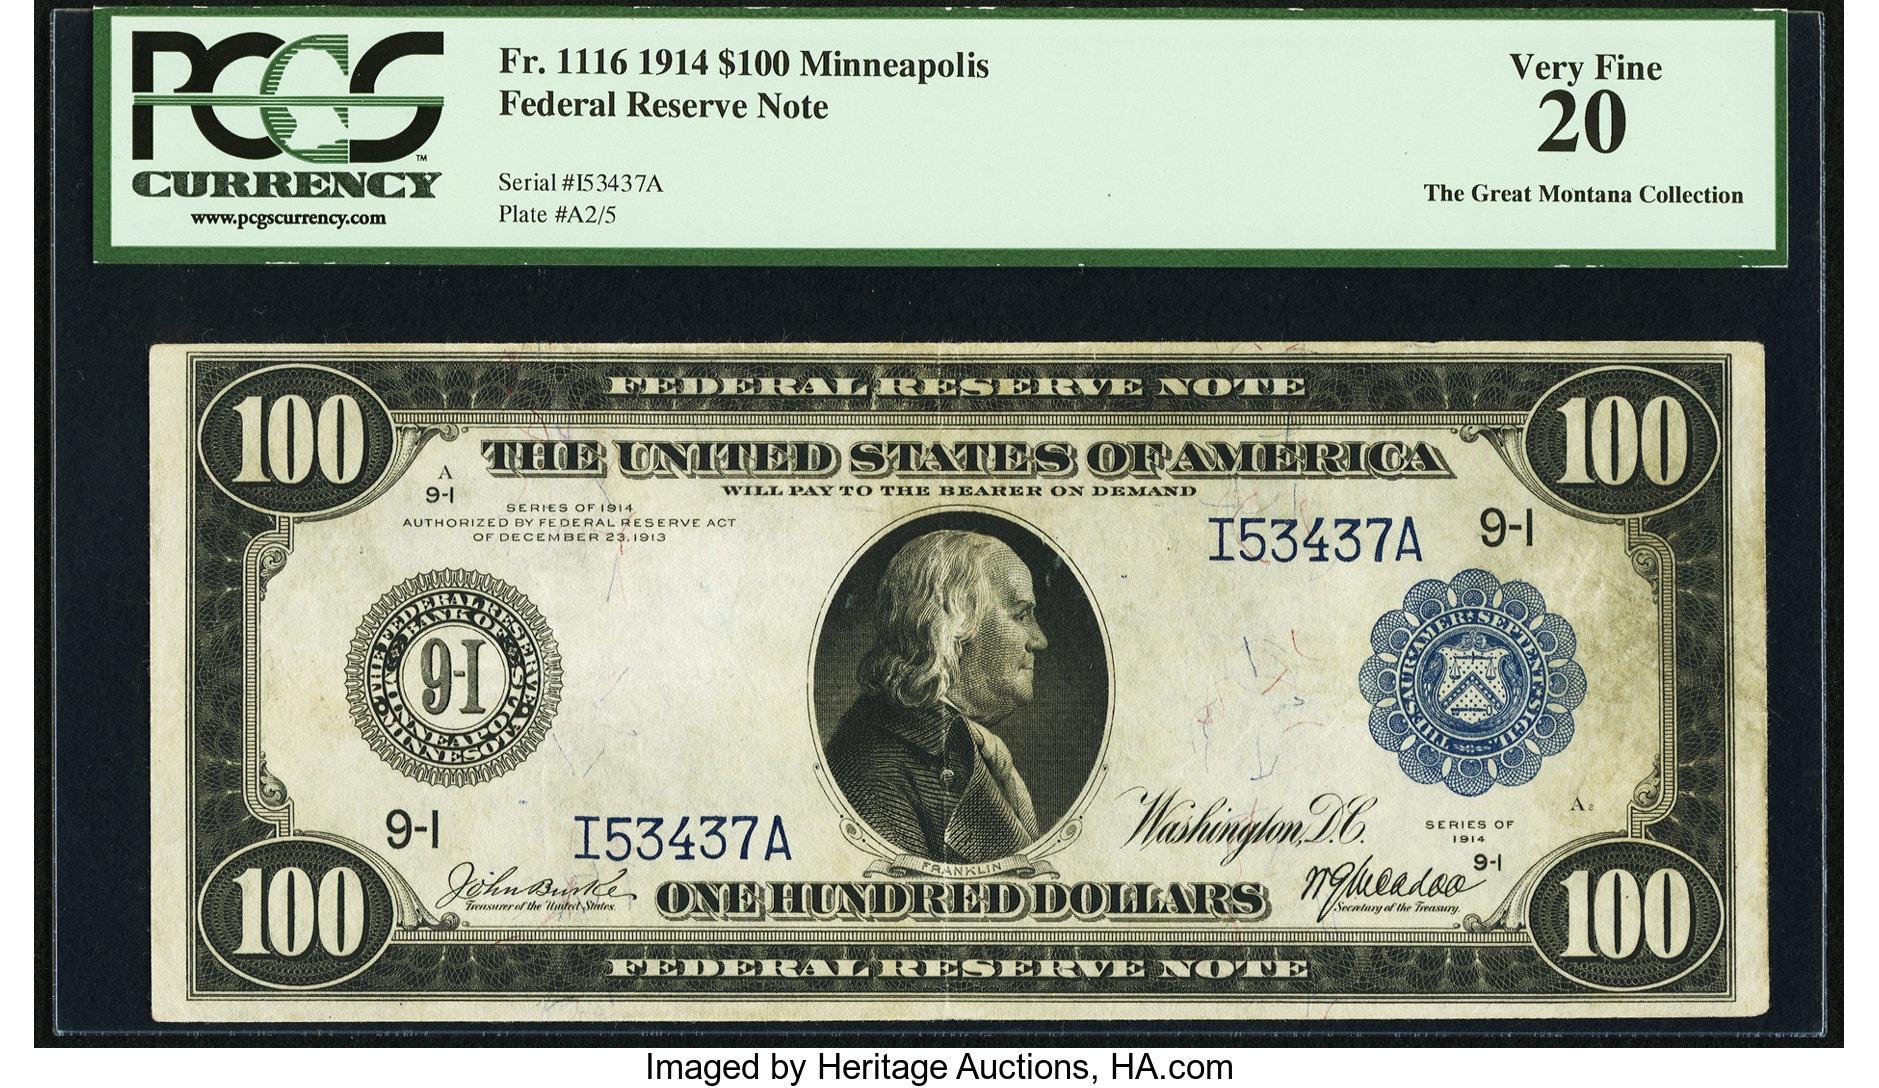 sample image for Fr.1116 $100 Minneapolis